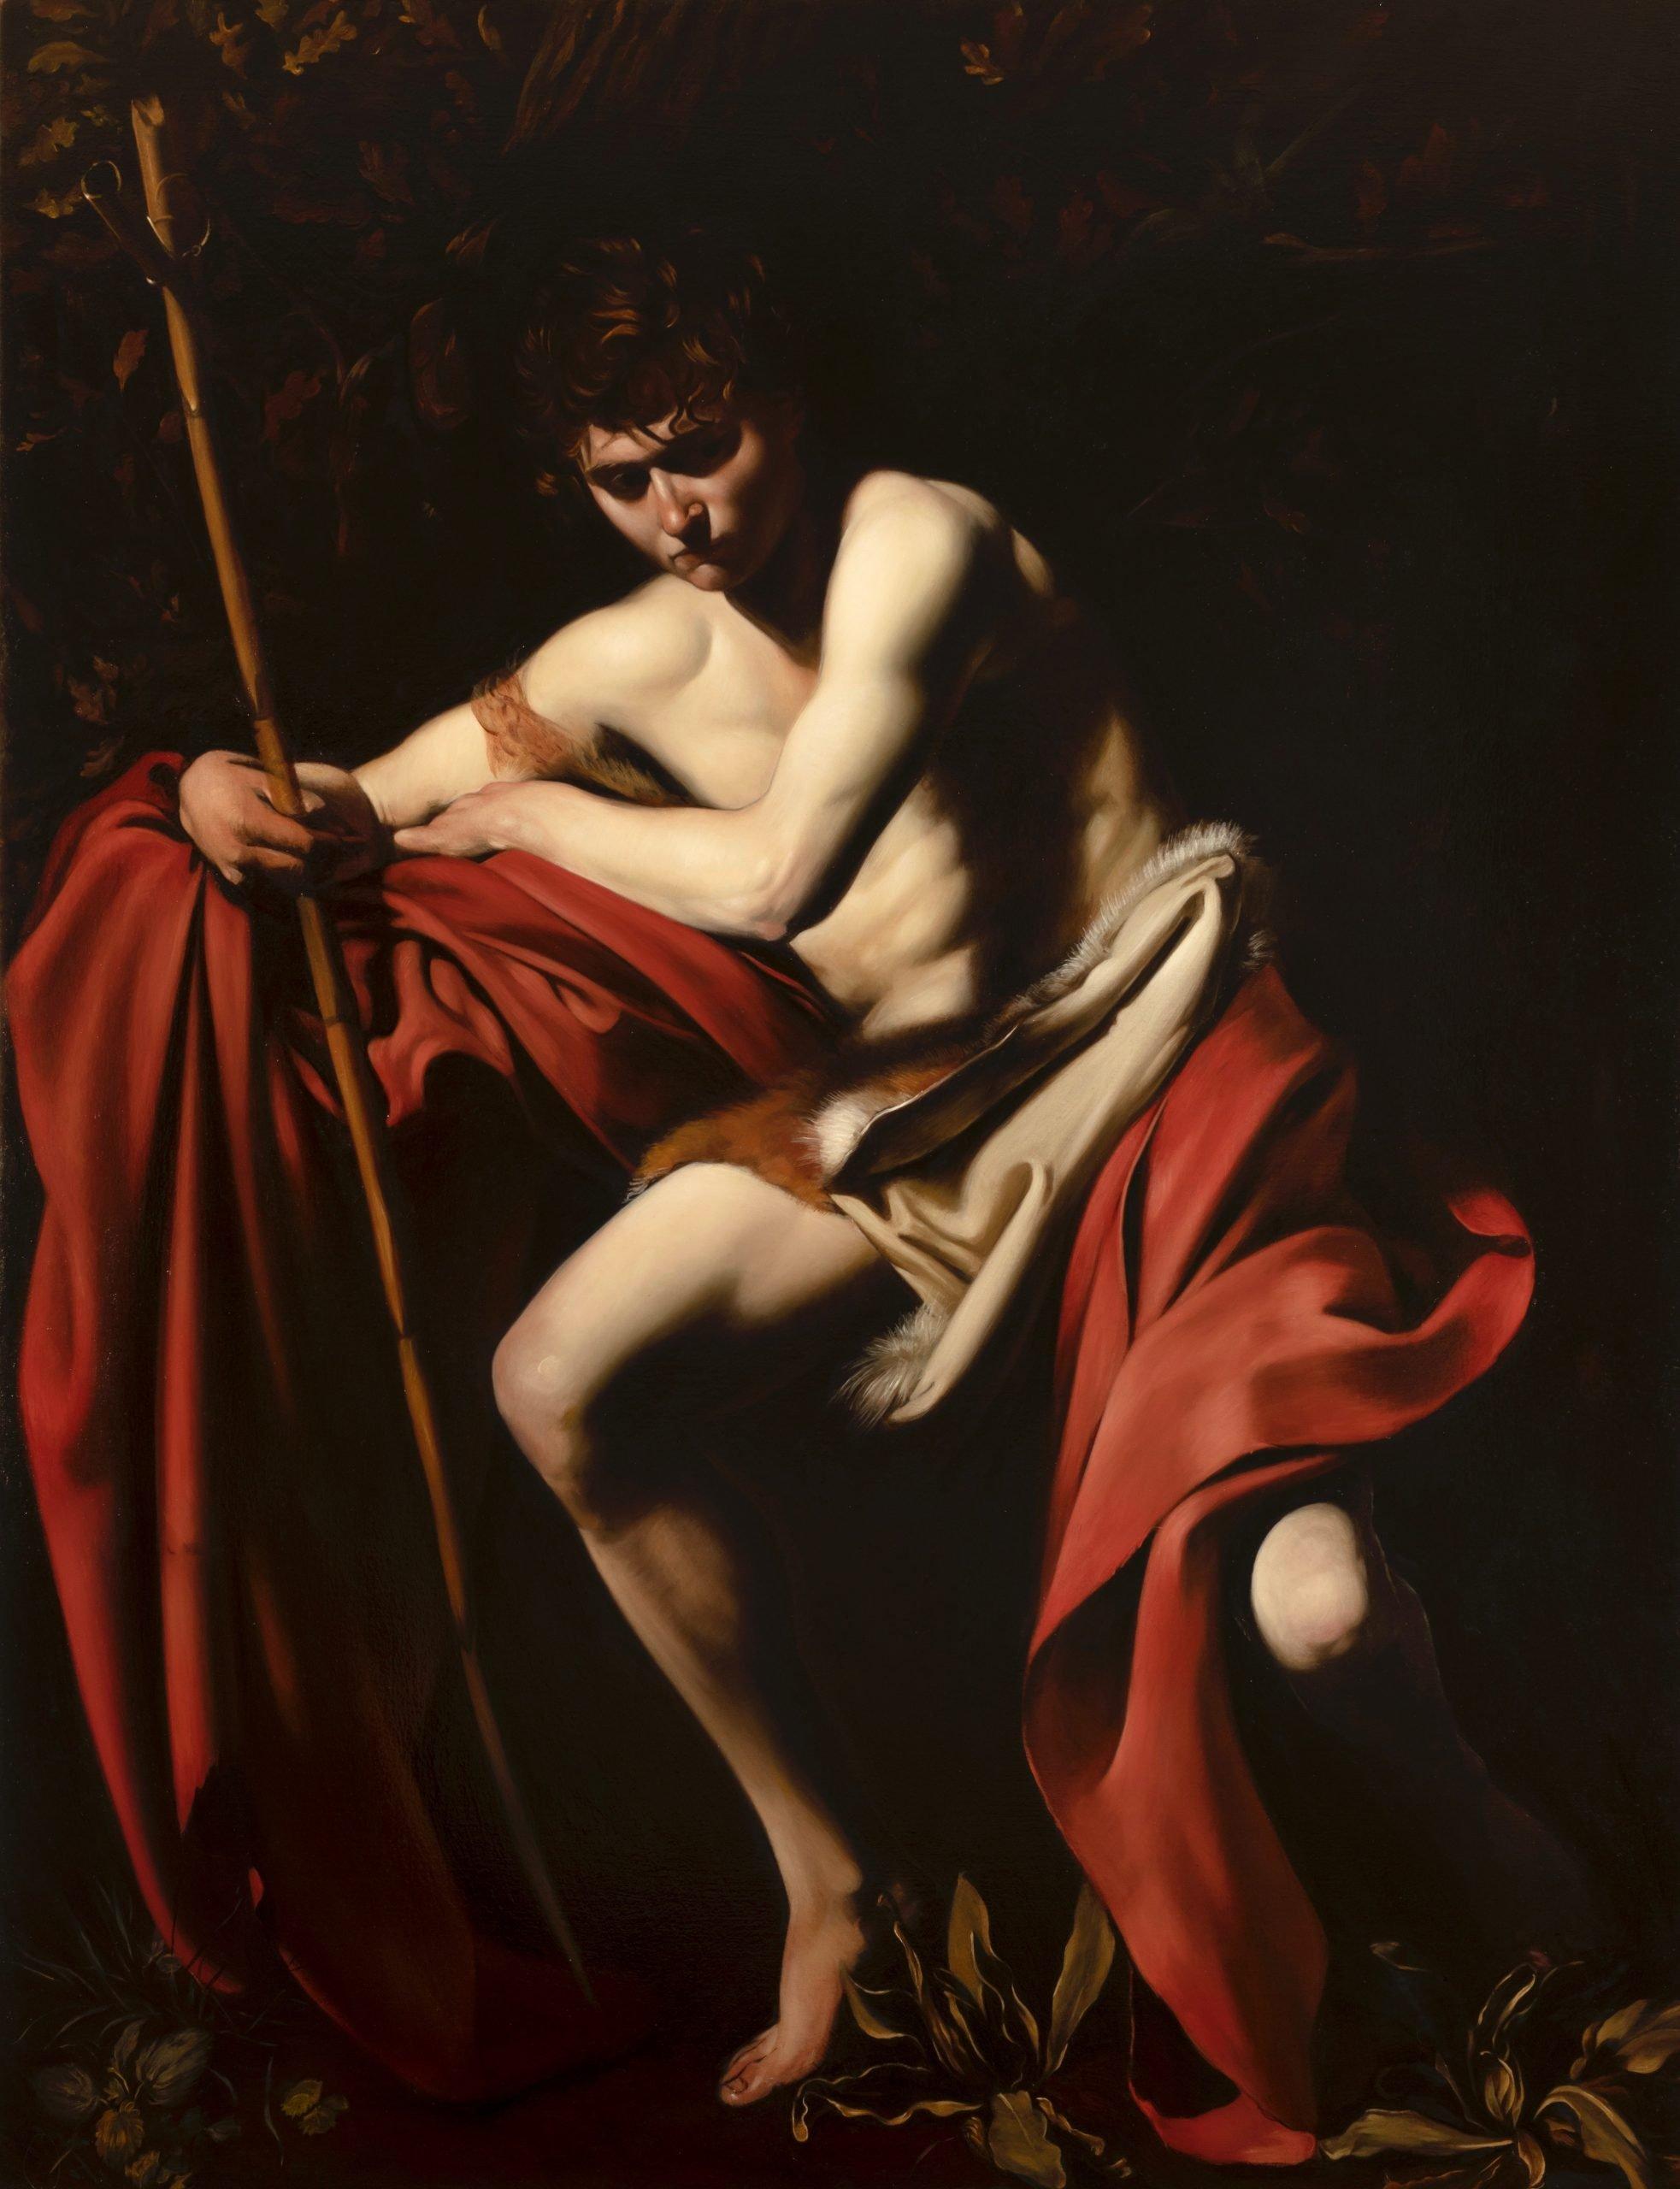 Oil painting copy by Desmond Mac Mahon of Caravaggio's St John the Baptist